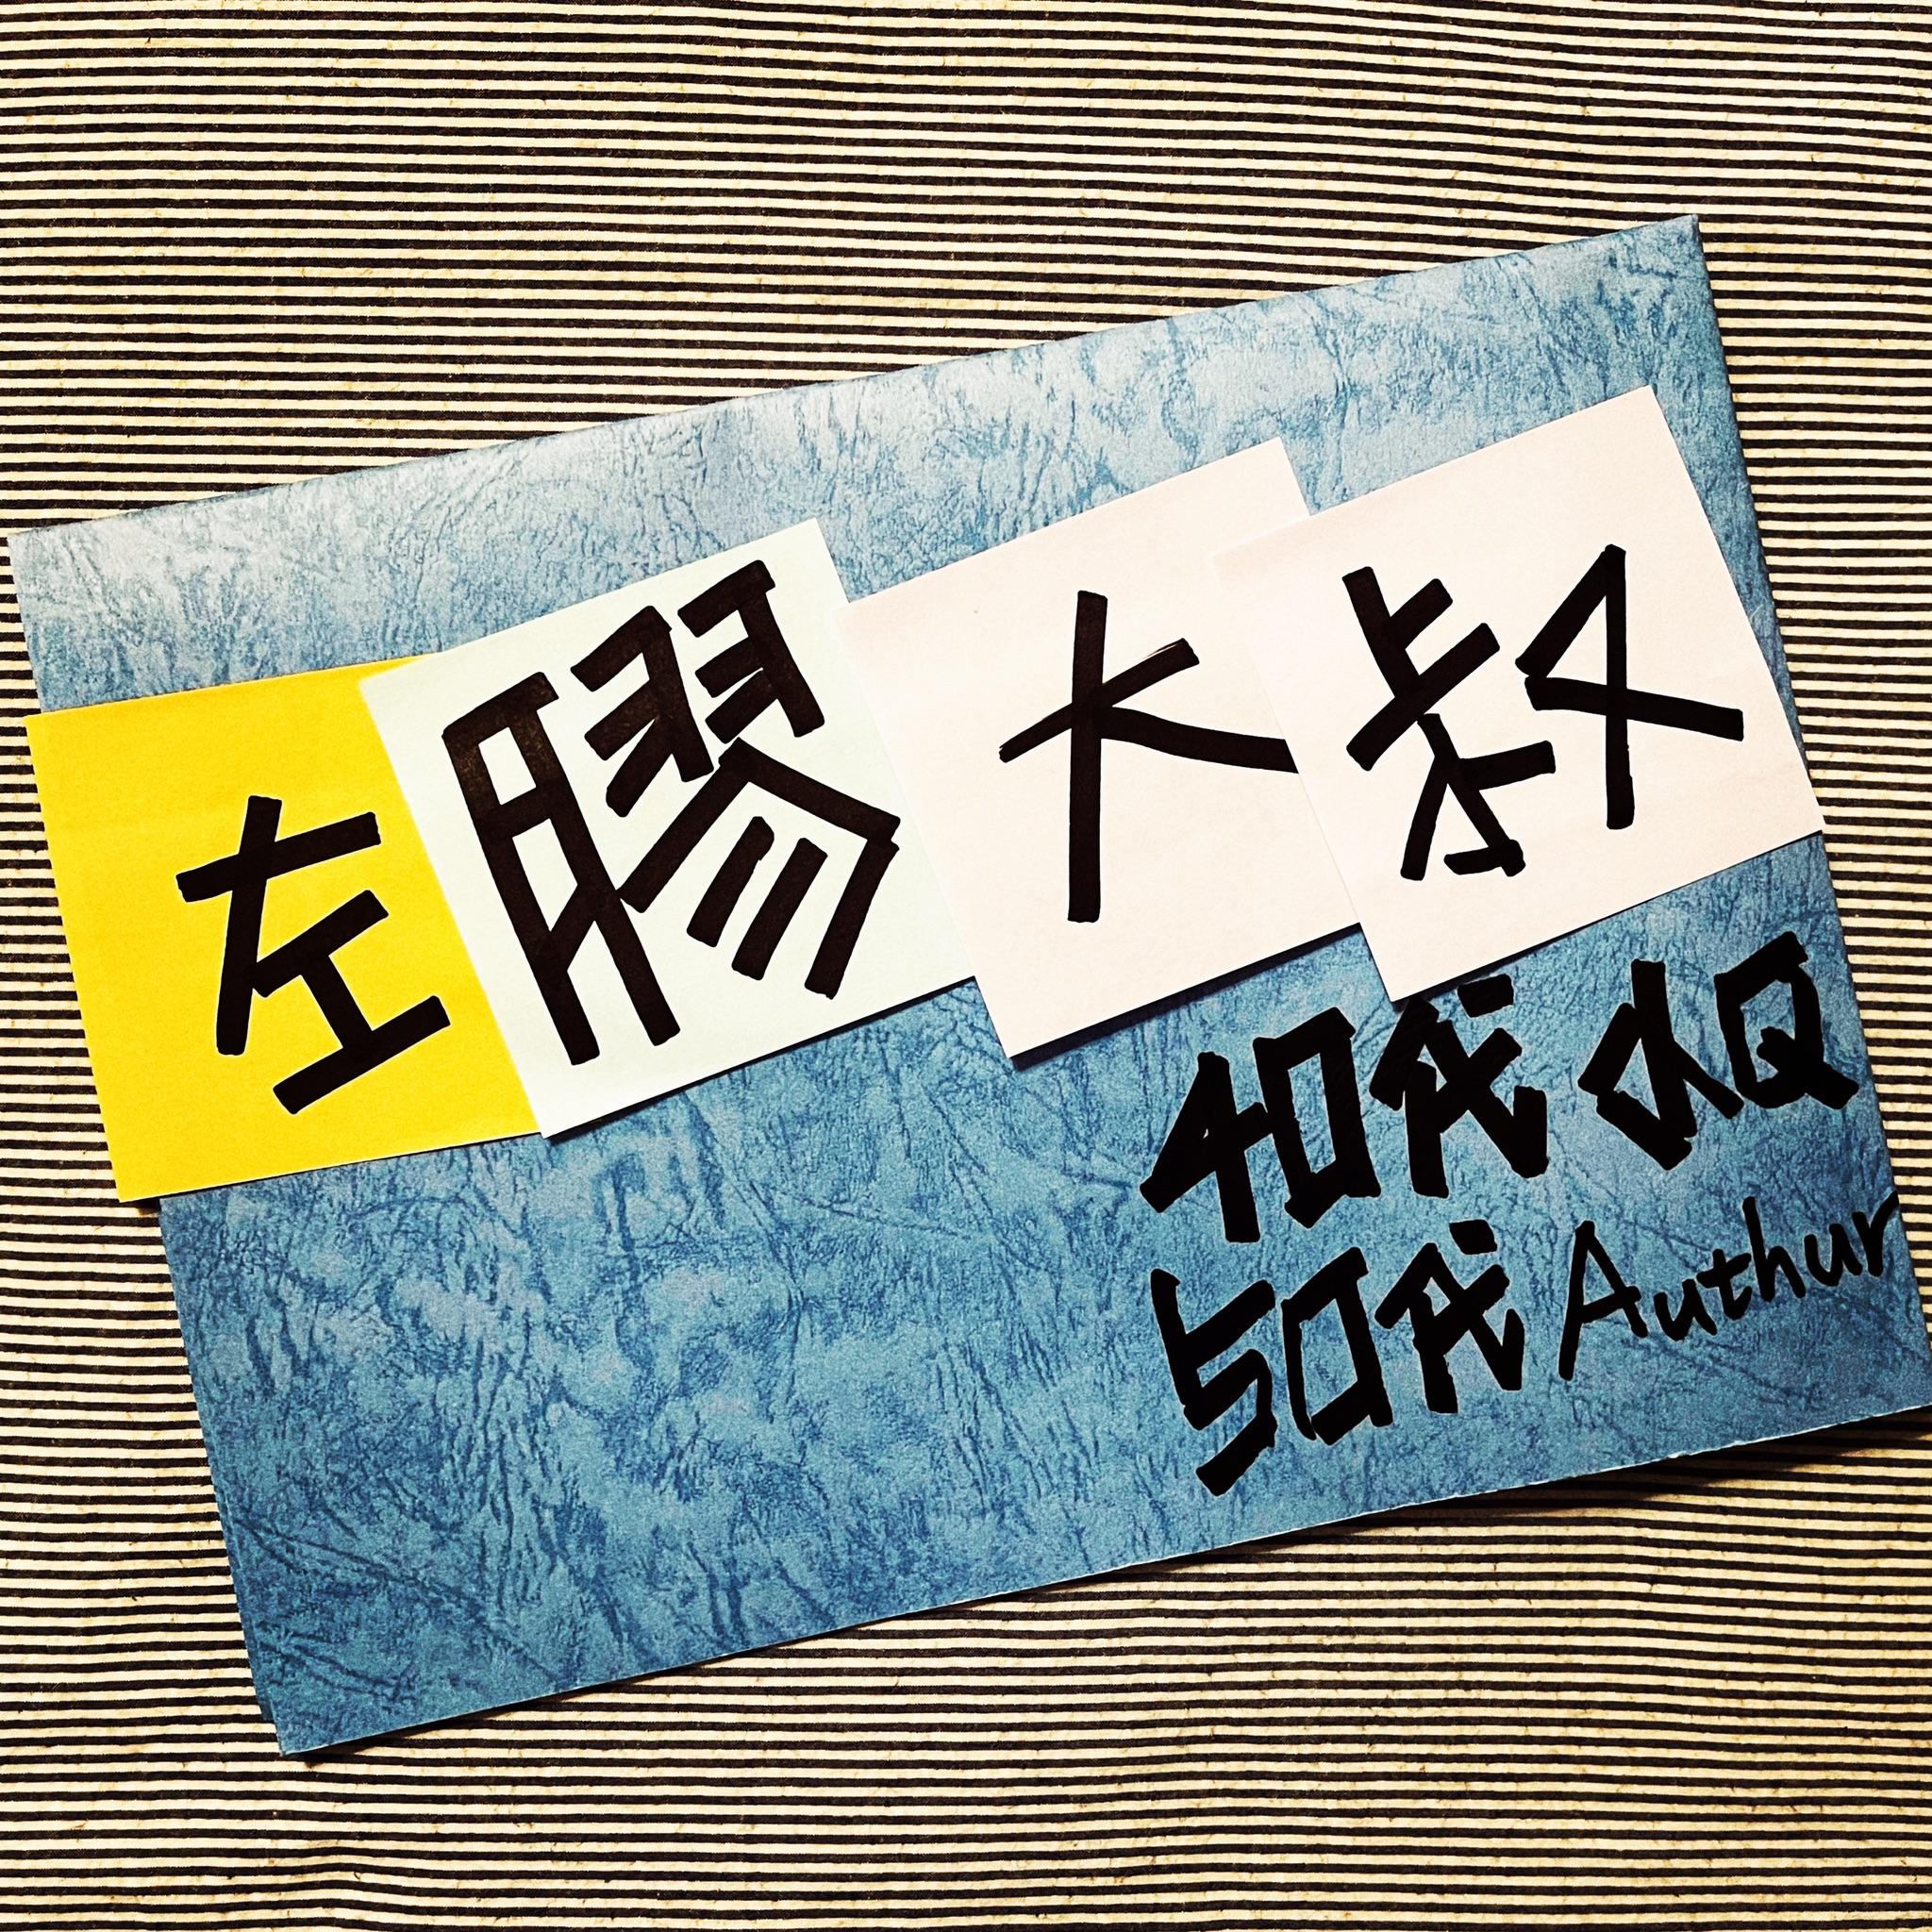 Ep.23-左膠神曲系列 : 約翰藍儂想像與蔡依林玫瑰少年,來深度聆聽兩首改變世界的歌